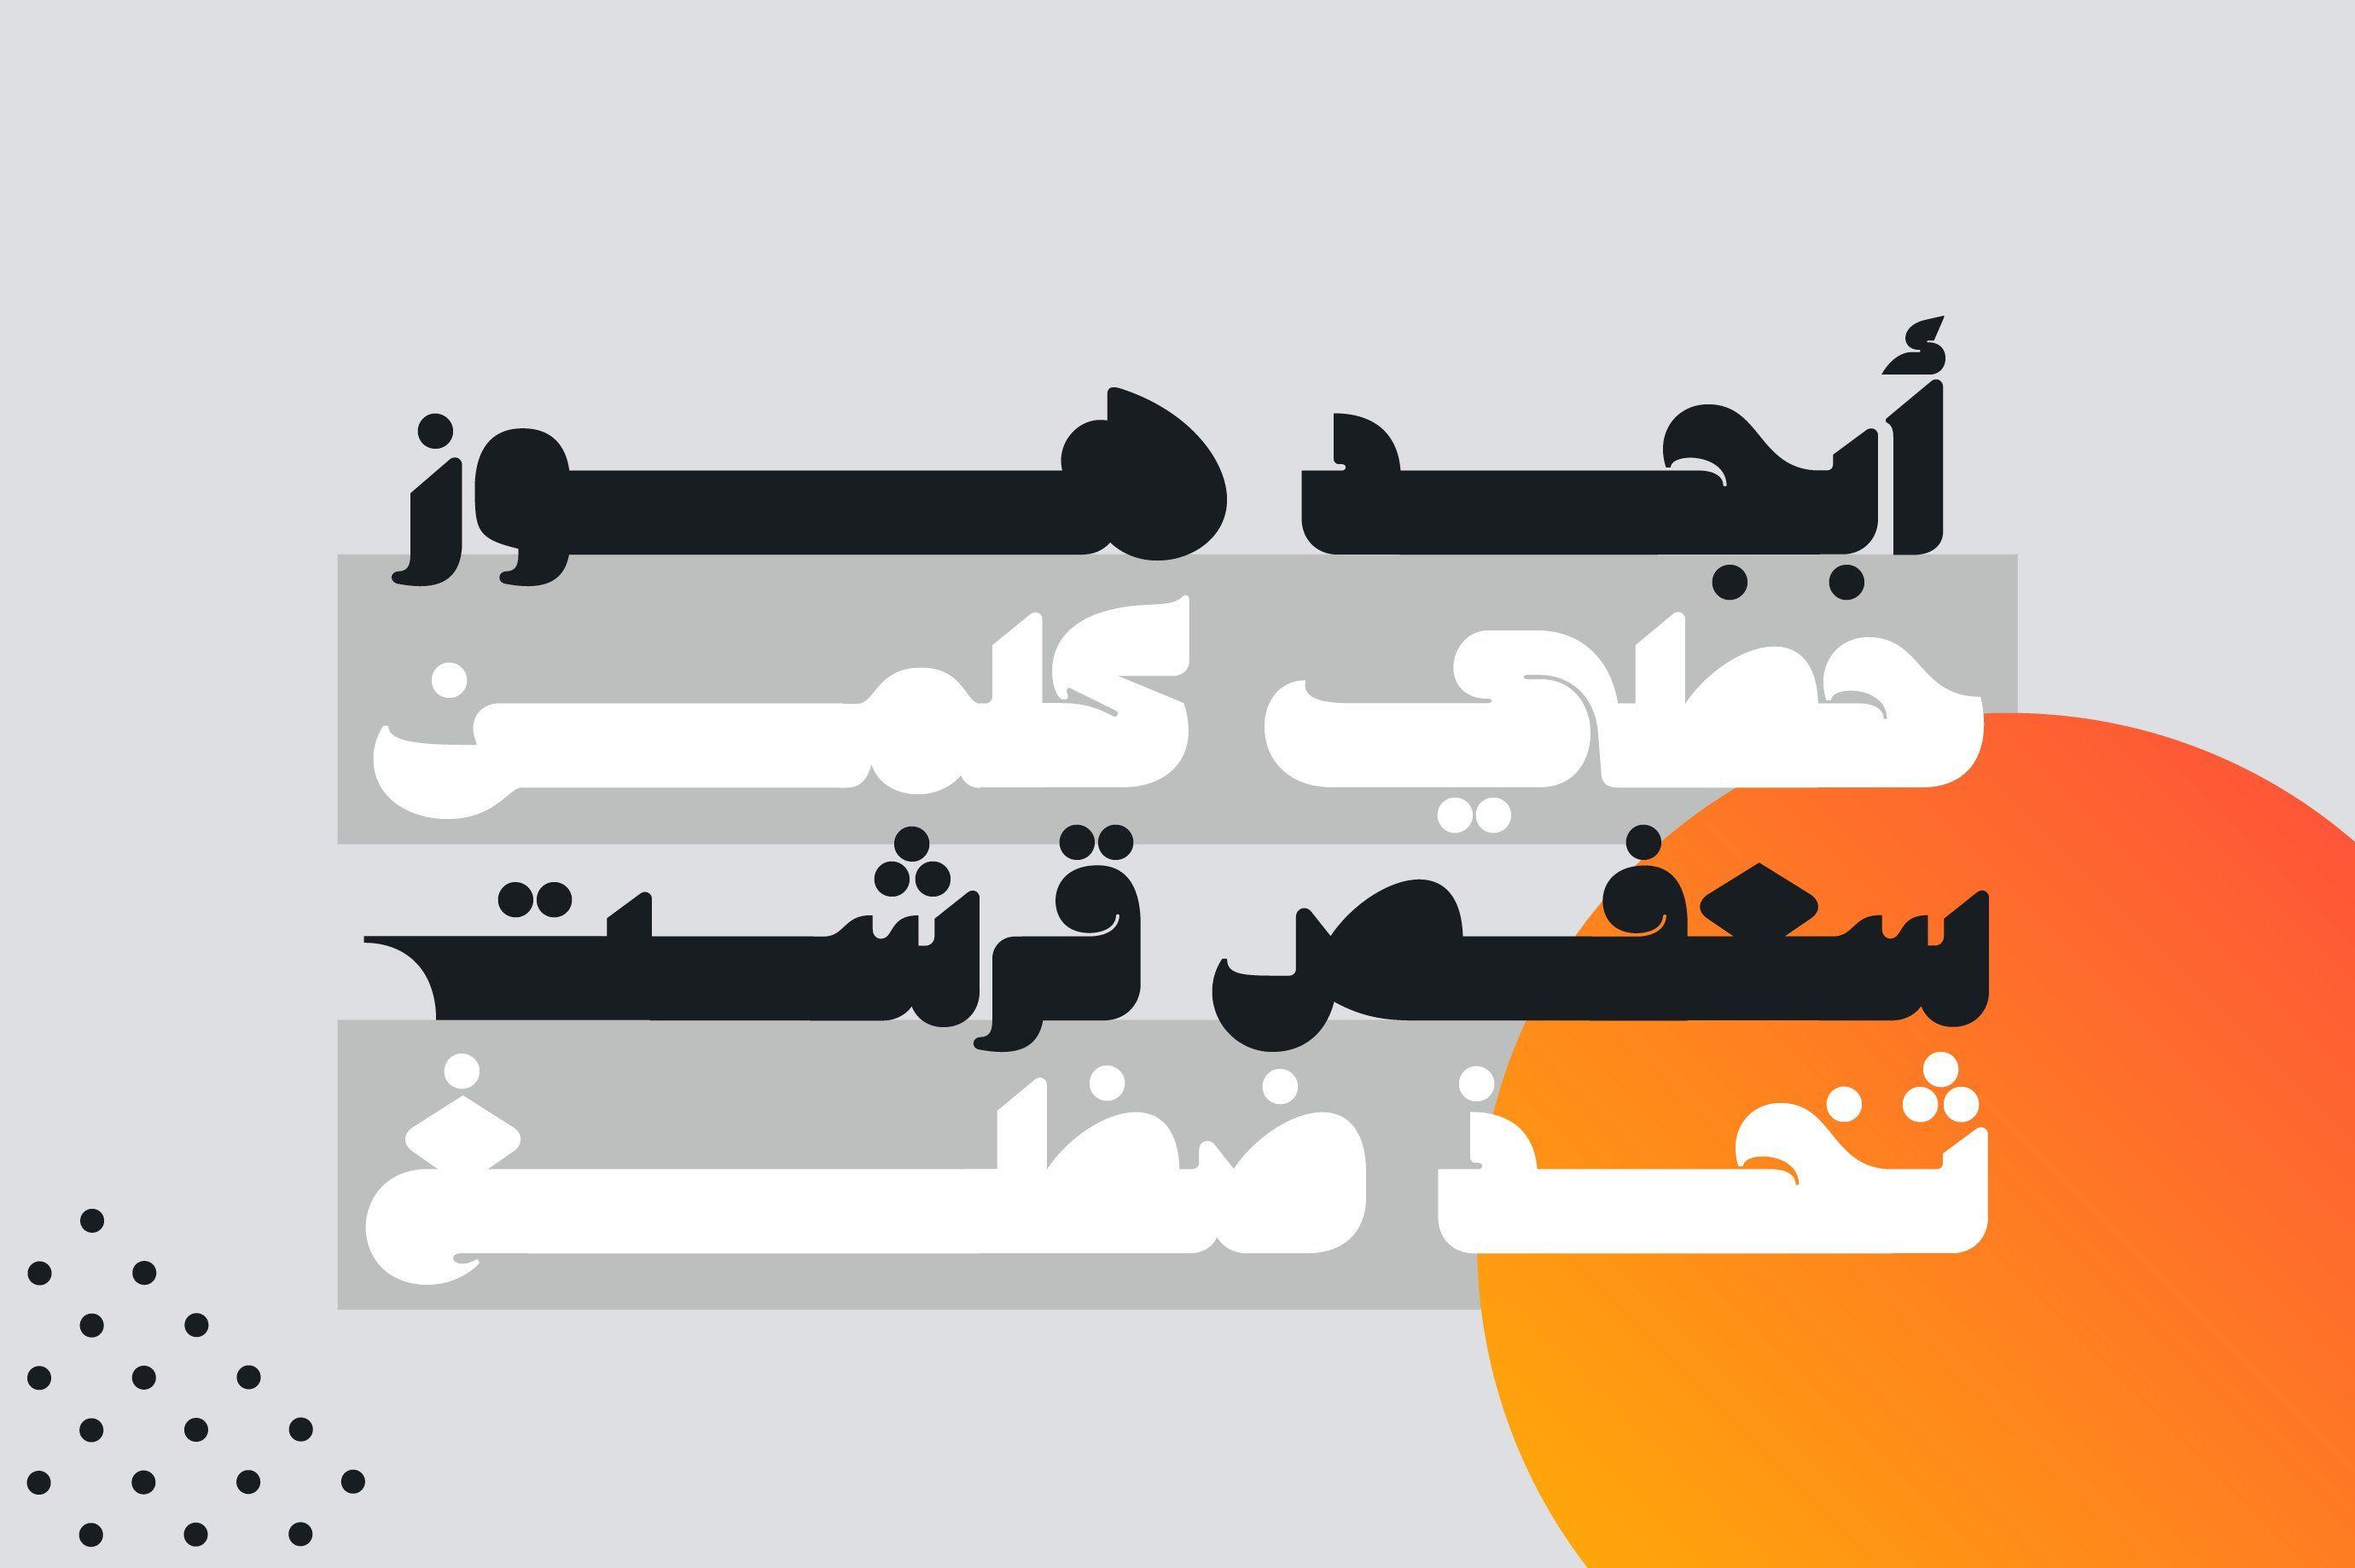 Makana Arabic Font By Mostafa El Abasiry On Creativemarket In 2020 Western Font Font Bundles Arabic Font